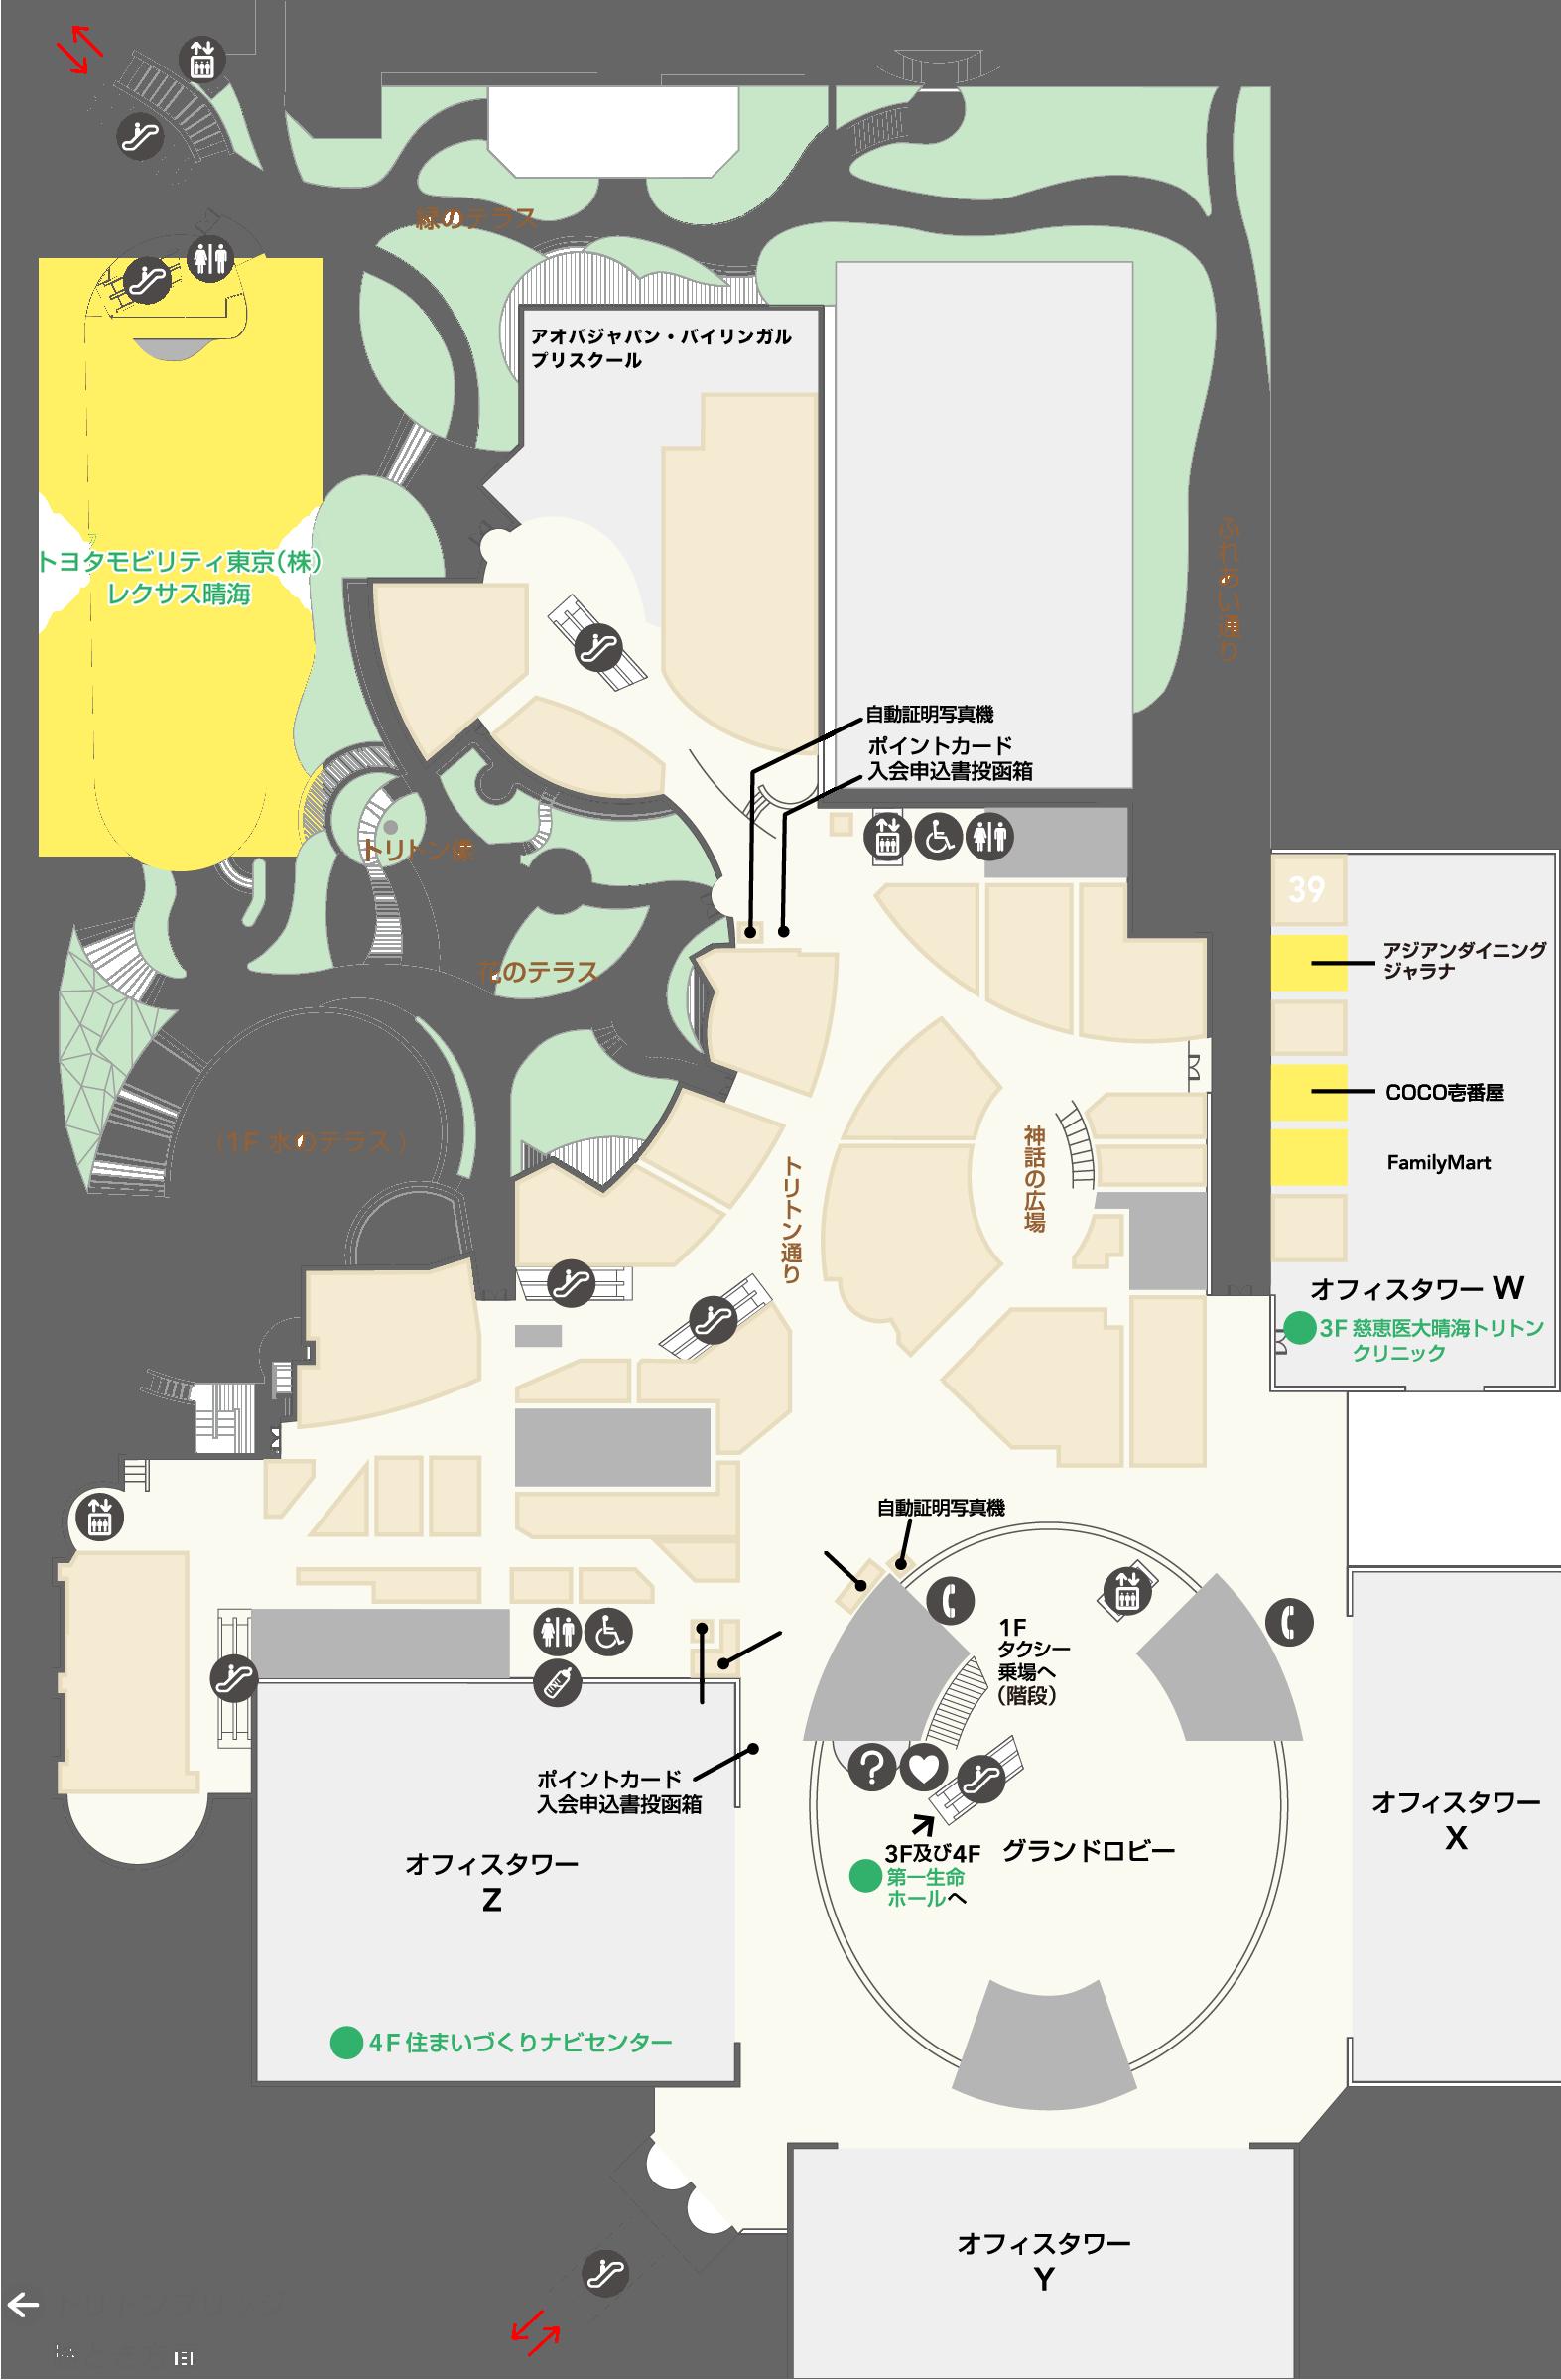 http://harumi-triton.jp/wp/wp-content/themes/TORITON/images/floor_map/map_2f.png